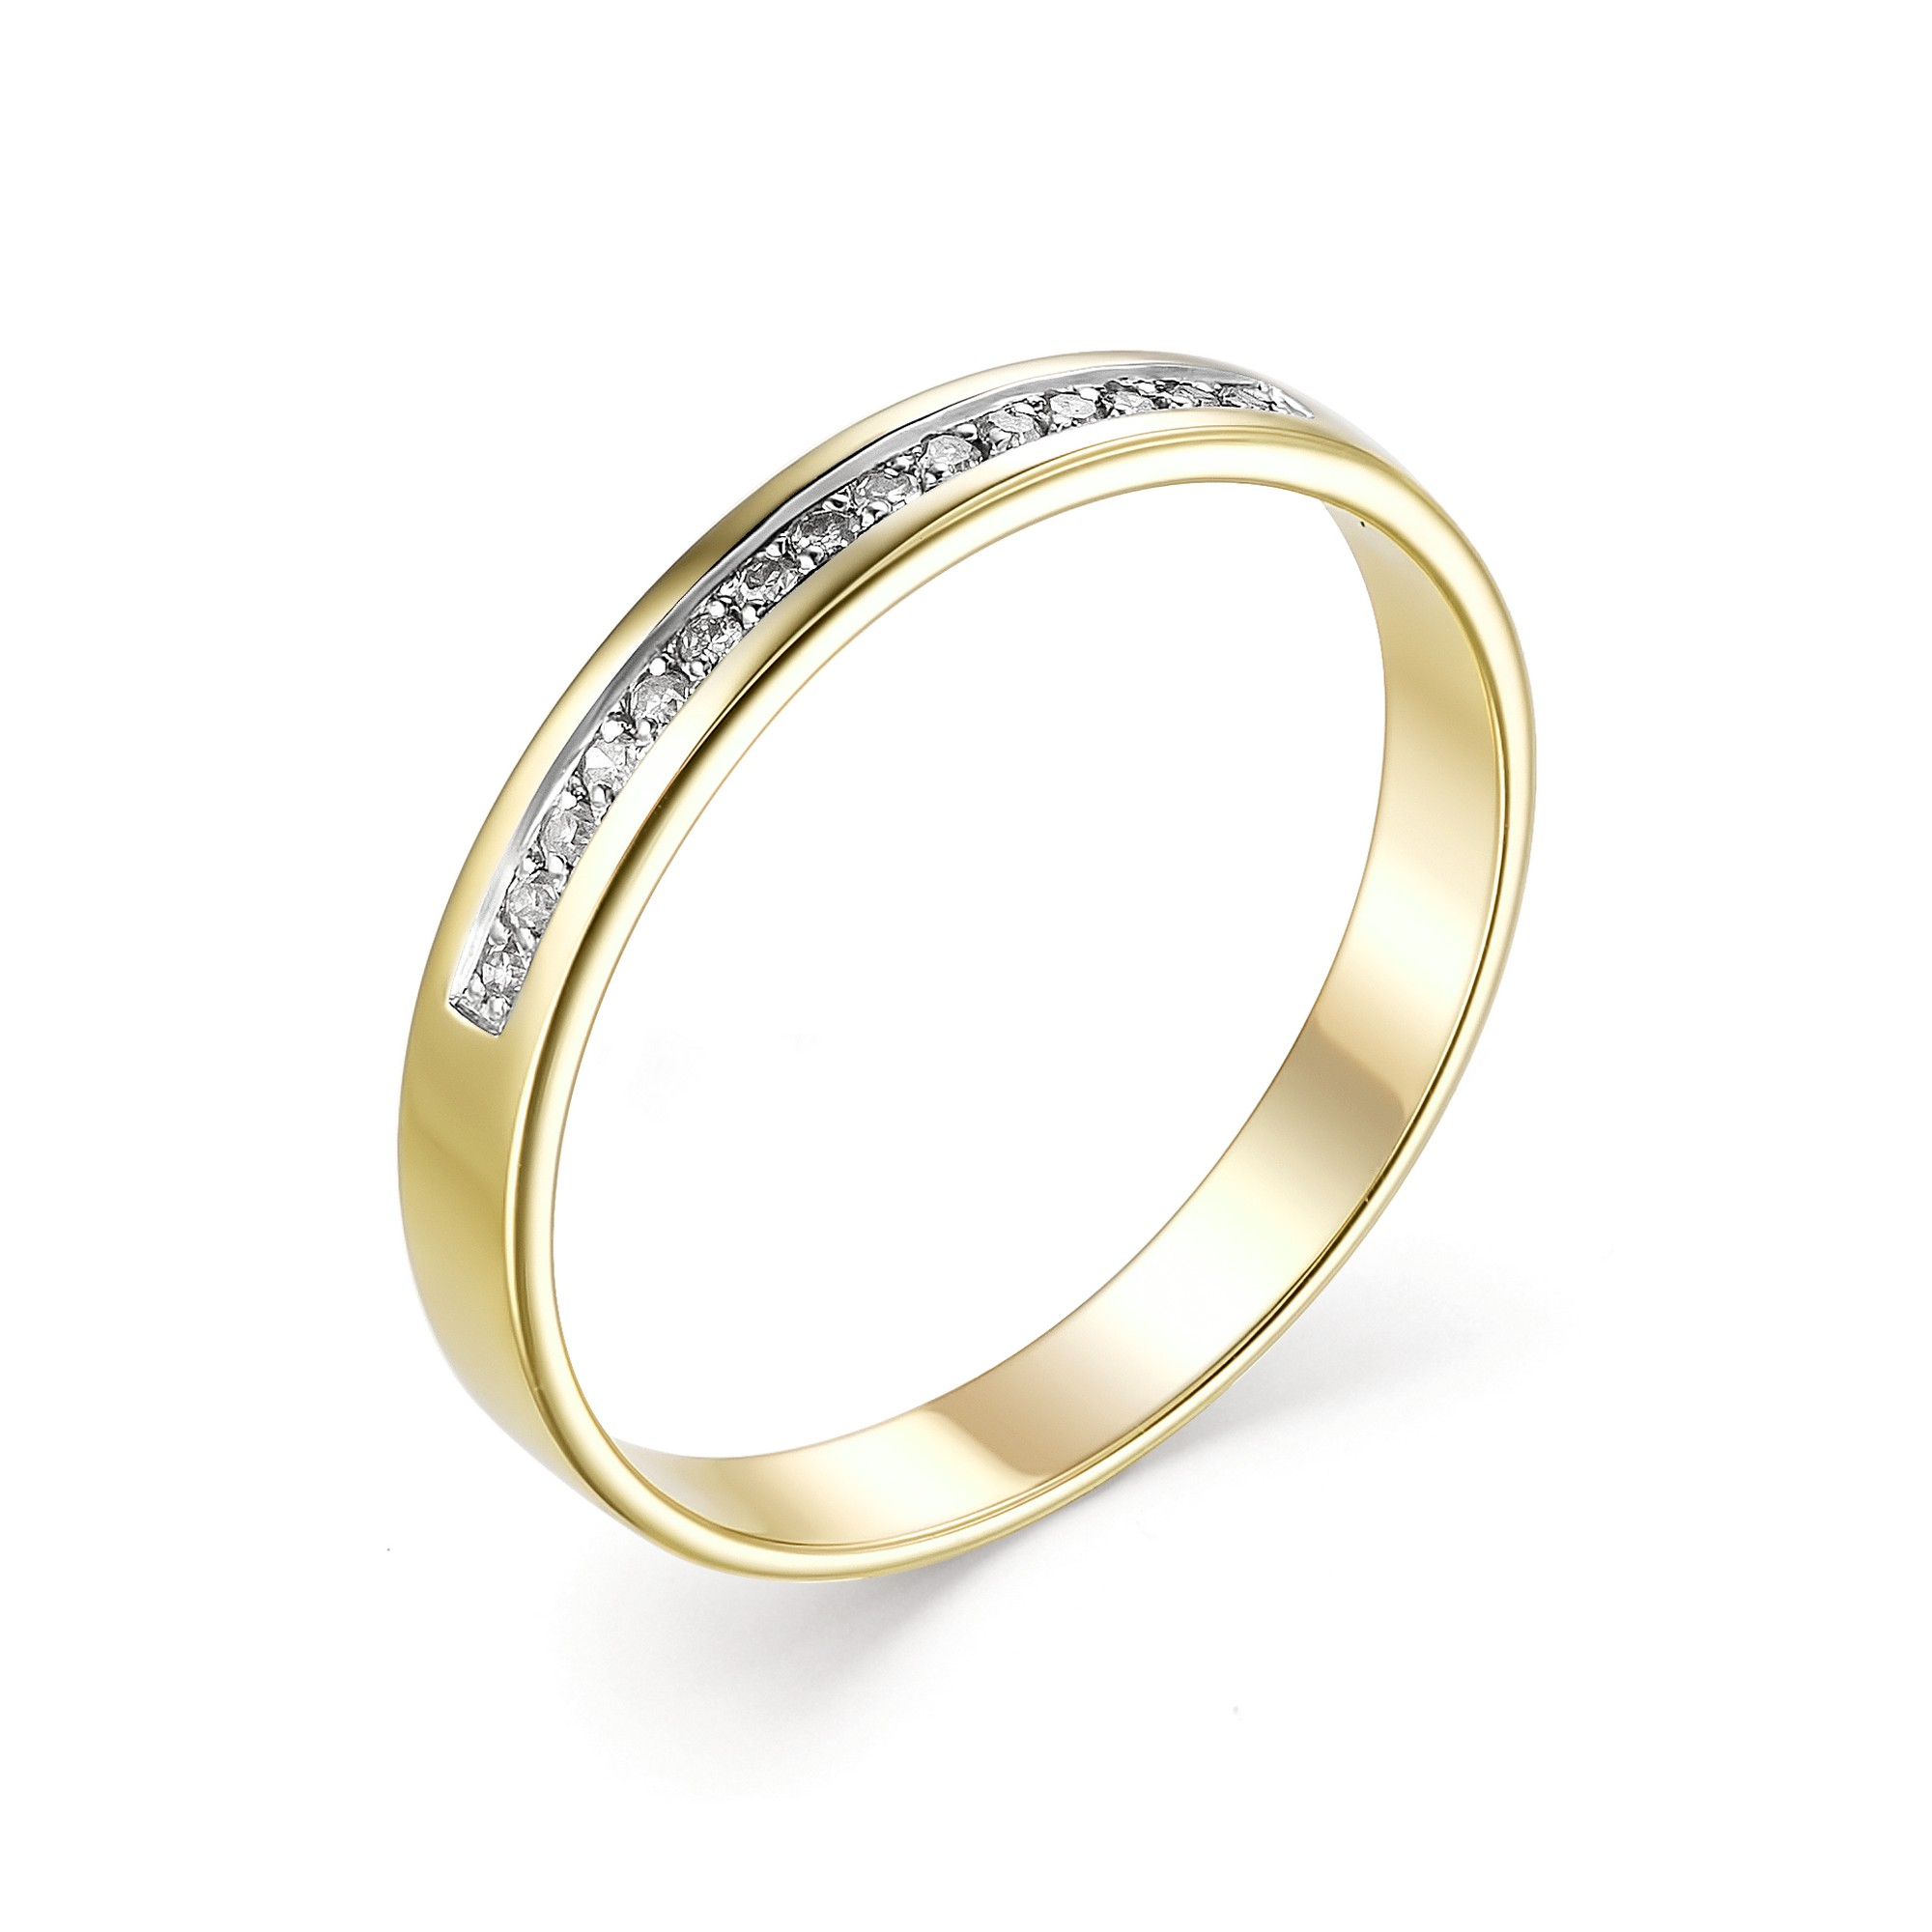 картинка кольцо 13235-300 15 бриллиант круг 17 0,068 200-400 2/3а 13235-300